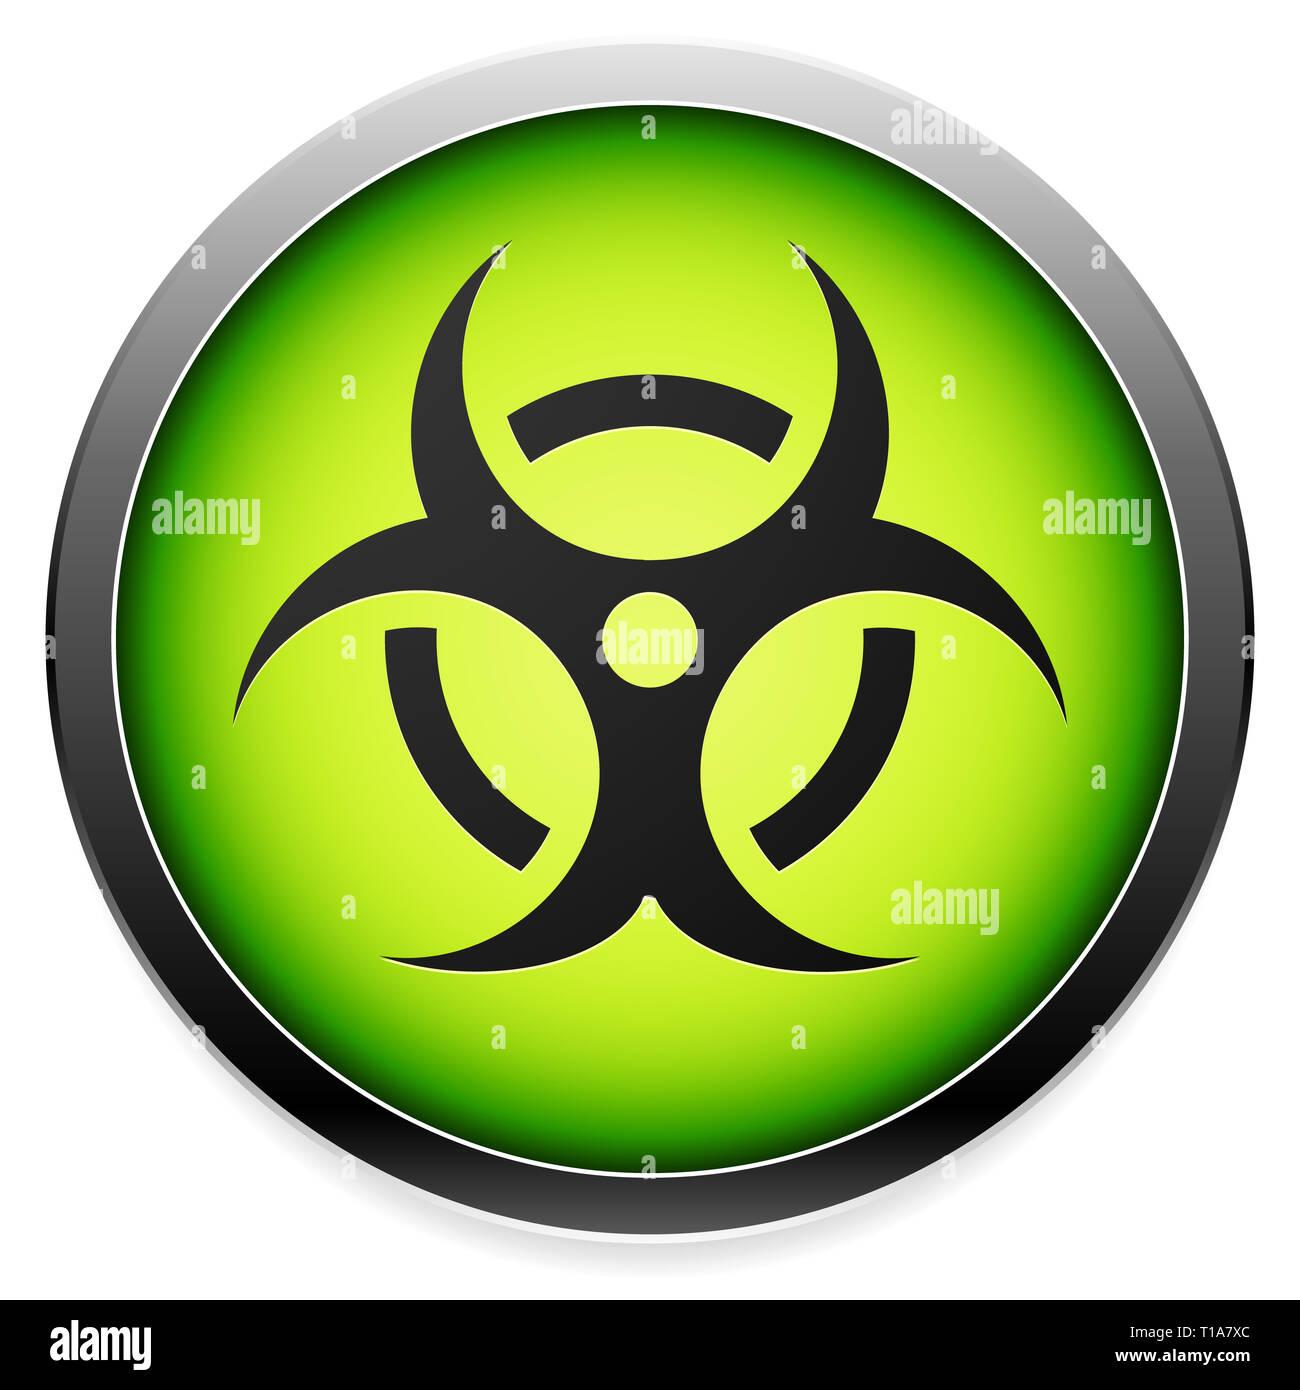 Quarantine, contamination, bio-hazard symbol, sign, icon in green. Vector - Stock Image